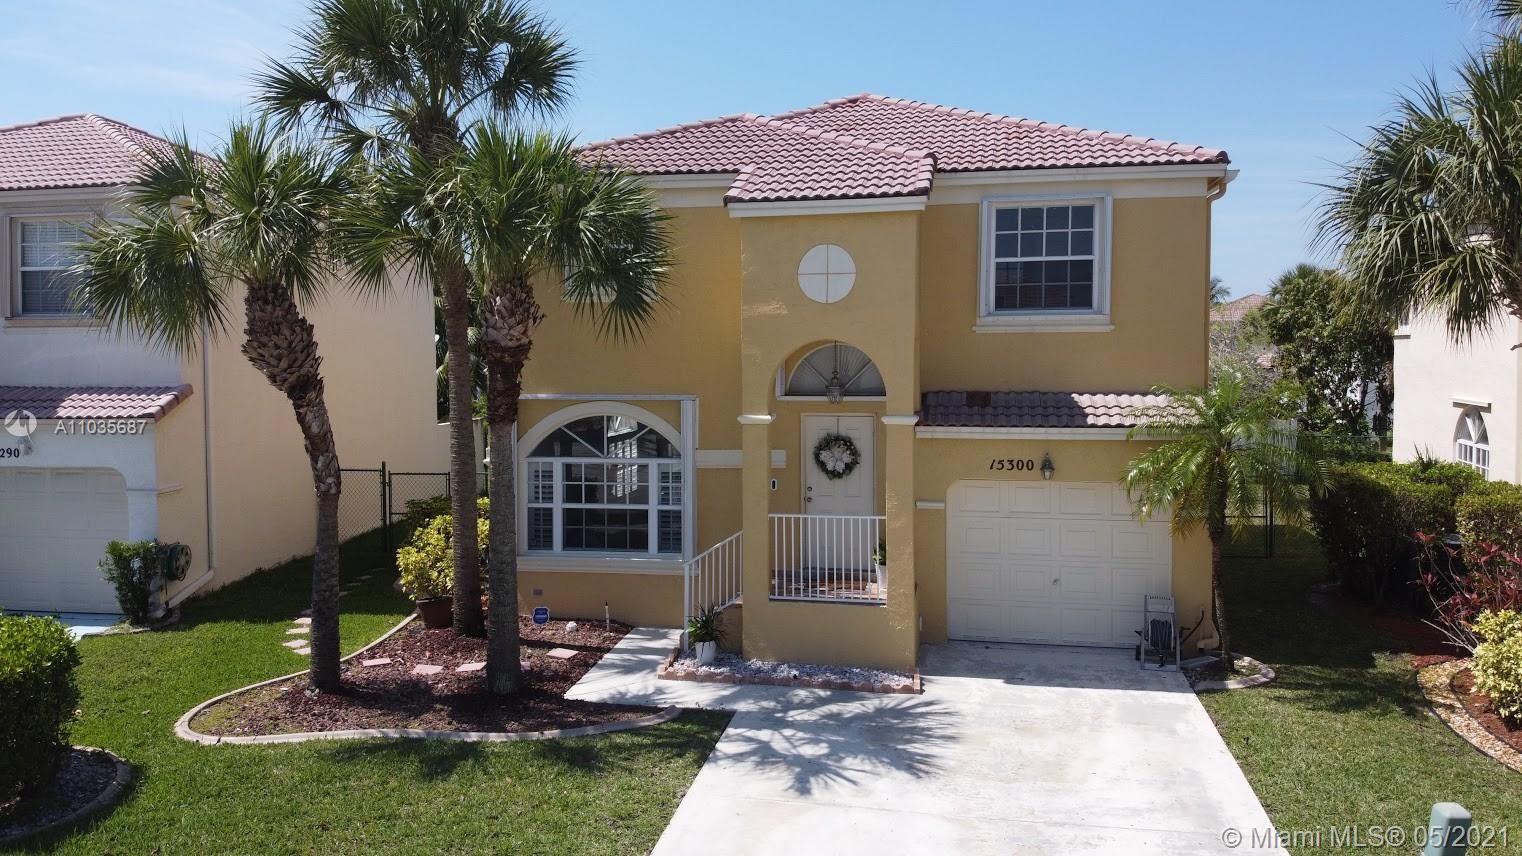 Photo of 15300 NW 7th St, Pembroke Pines, FL 33028 (MLS # A11035687)